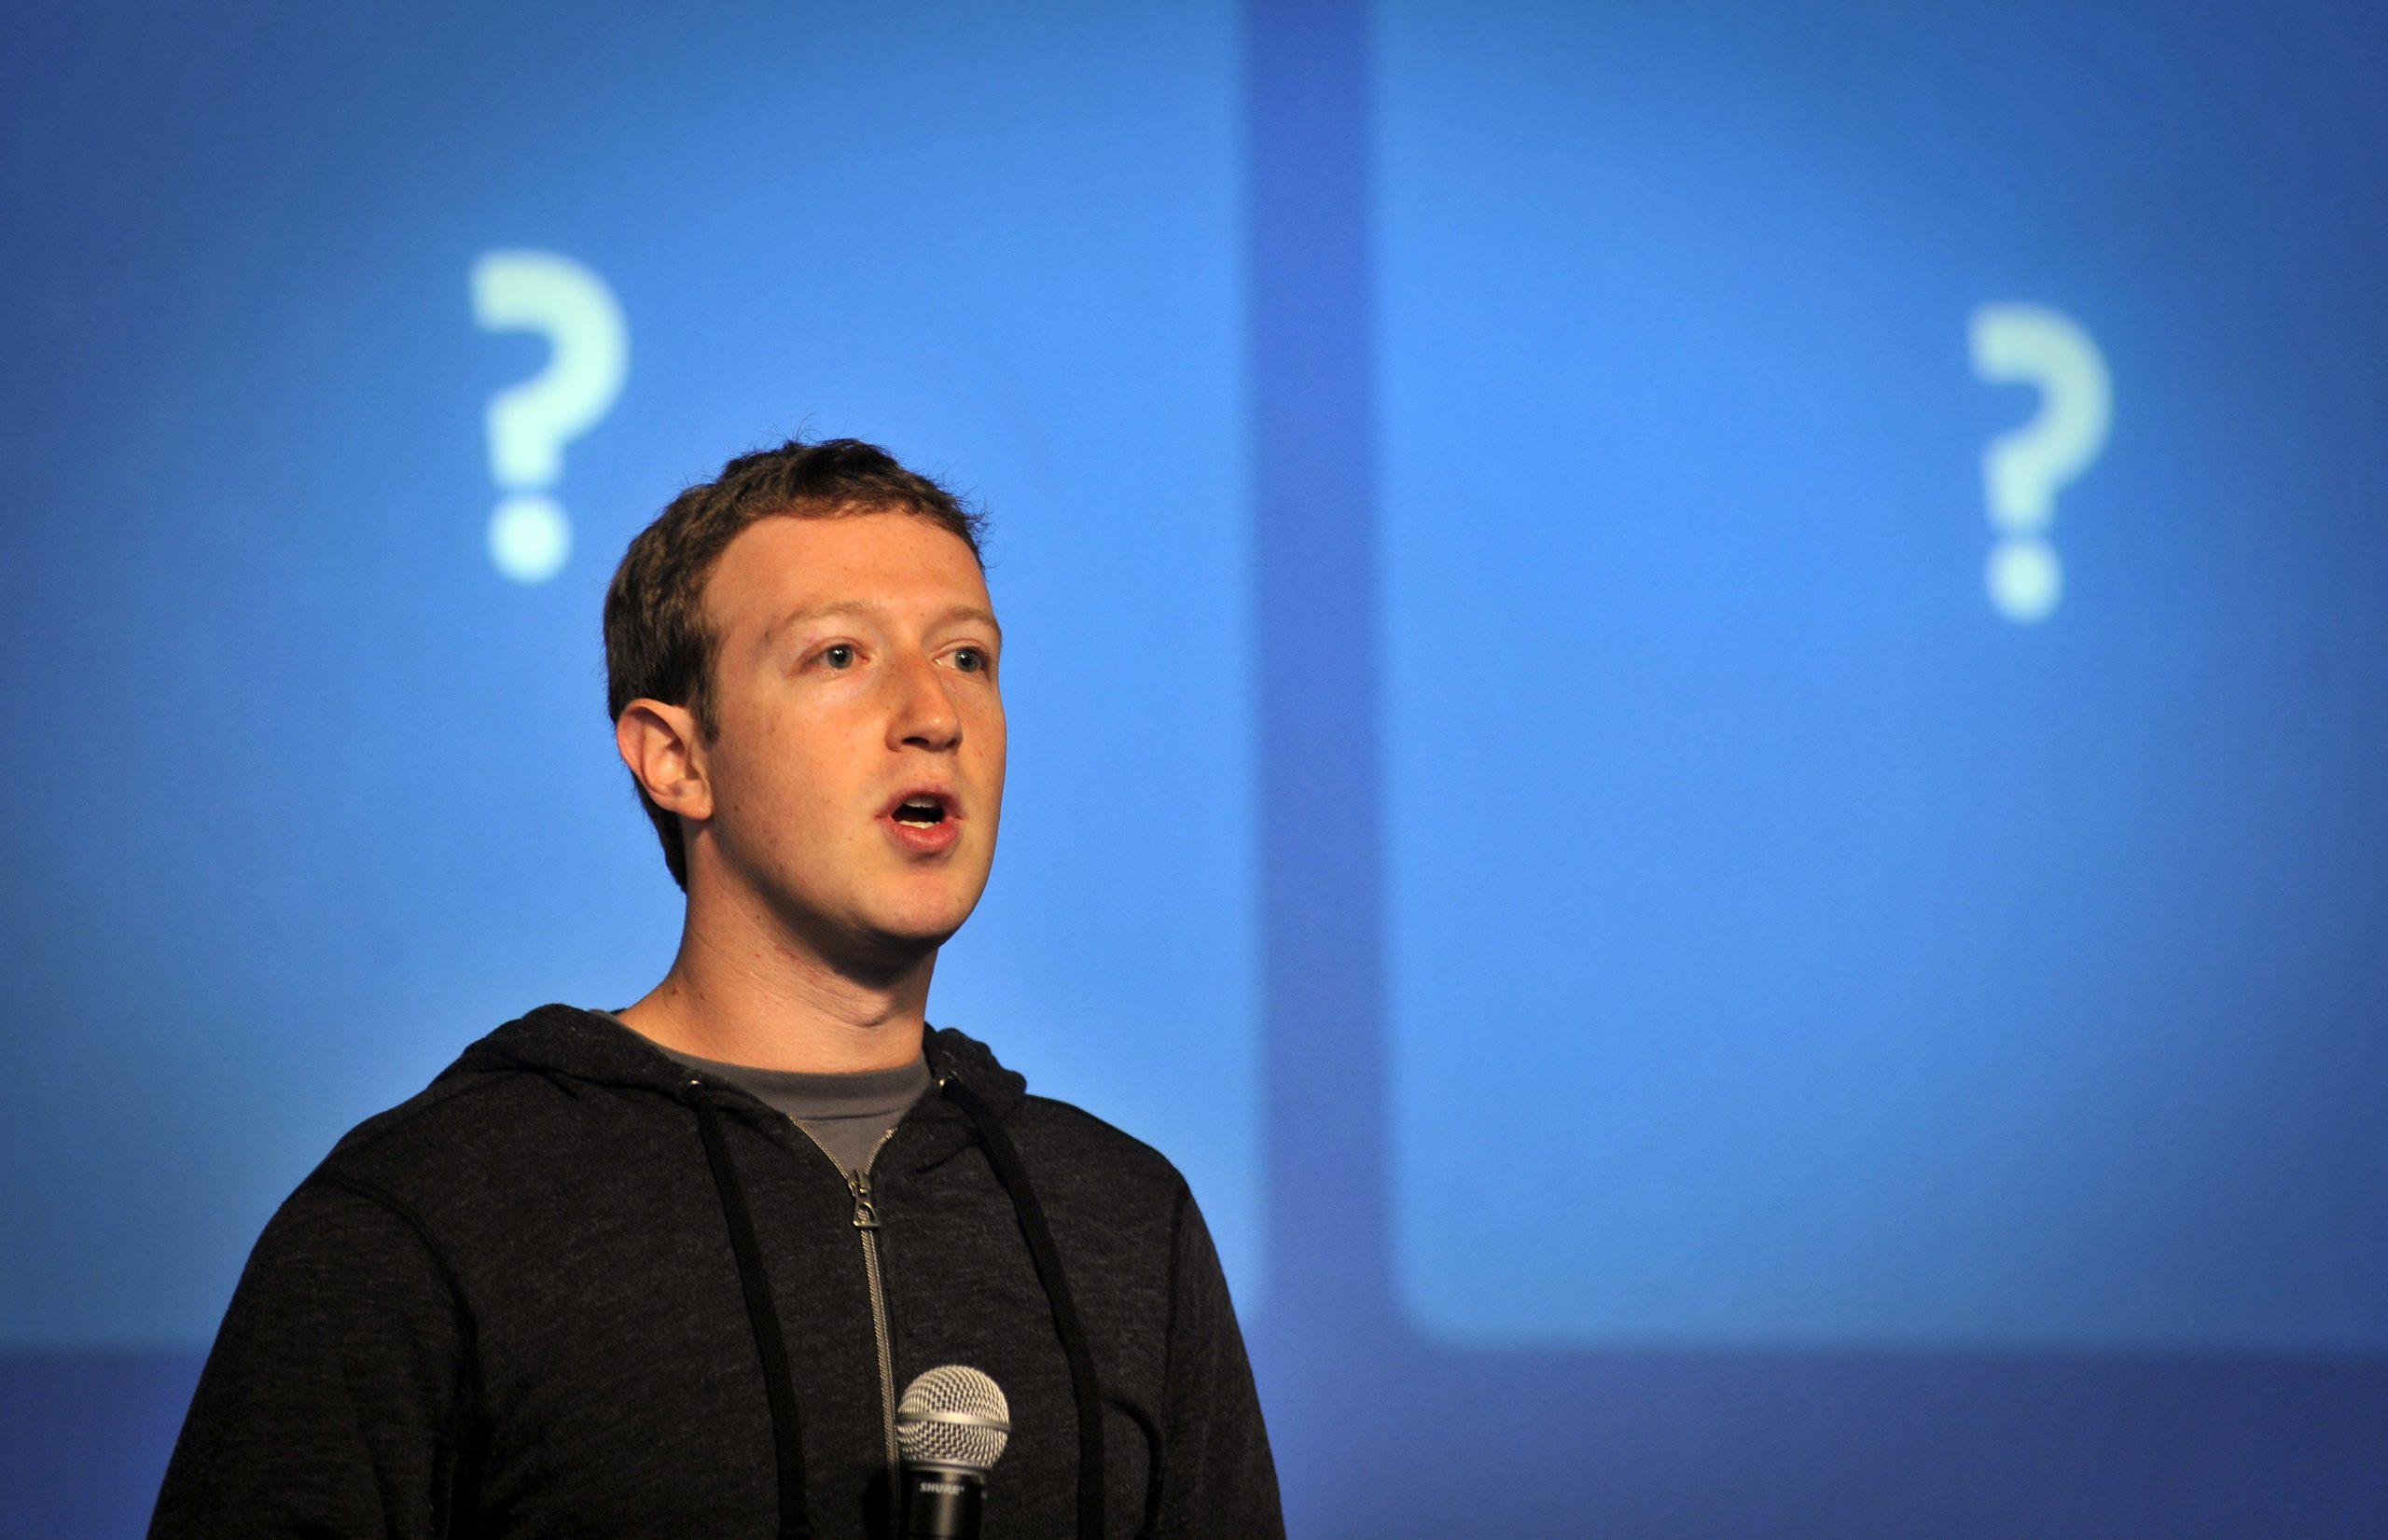 Facebook will start warning people who 'like' or react to fake coronavirus news